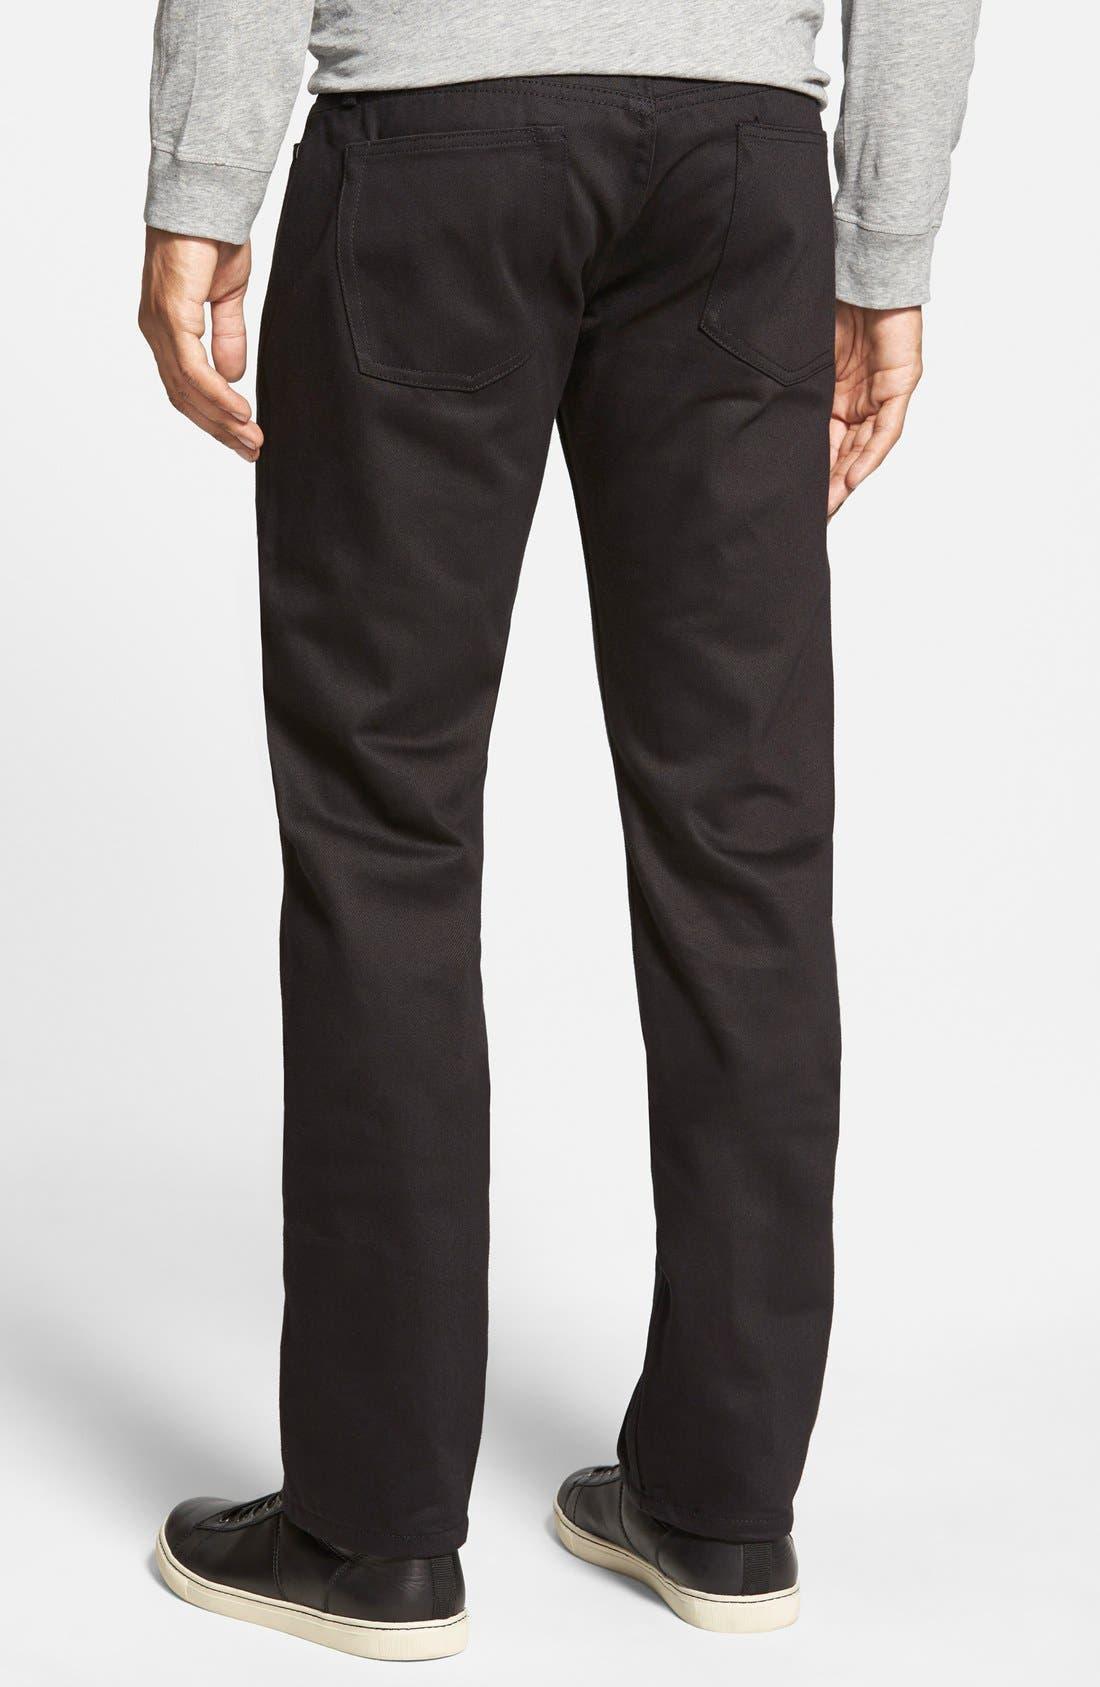 Alternate Image 2  - The Unbranded Brand 'UB255' Slim Tapered Fit Raw Selvedge Jeans (Black Selvedge)